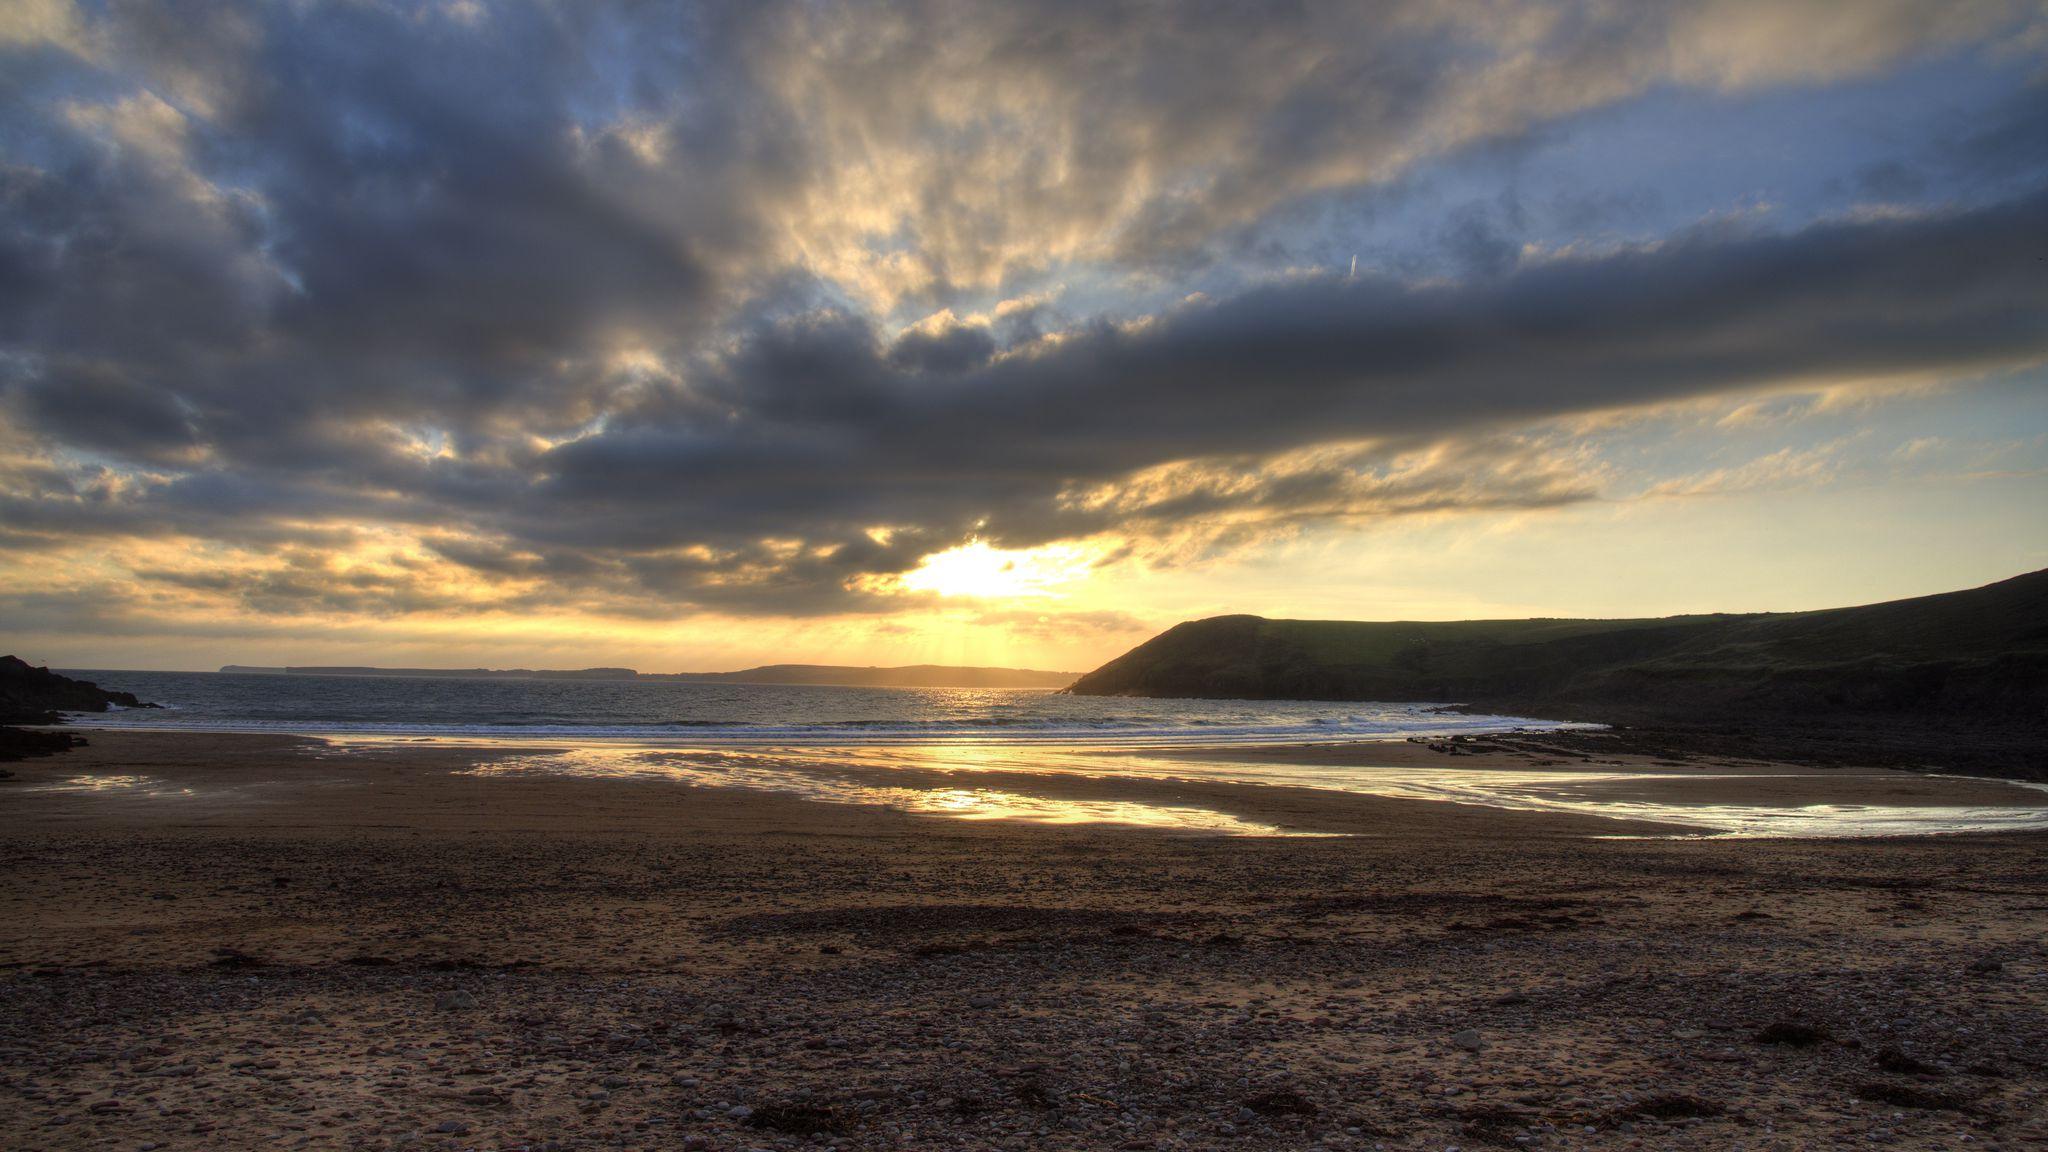 2048x1152 Wallpaper shore, water, sunset, landscape